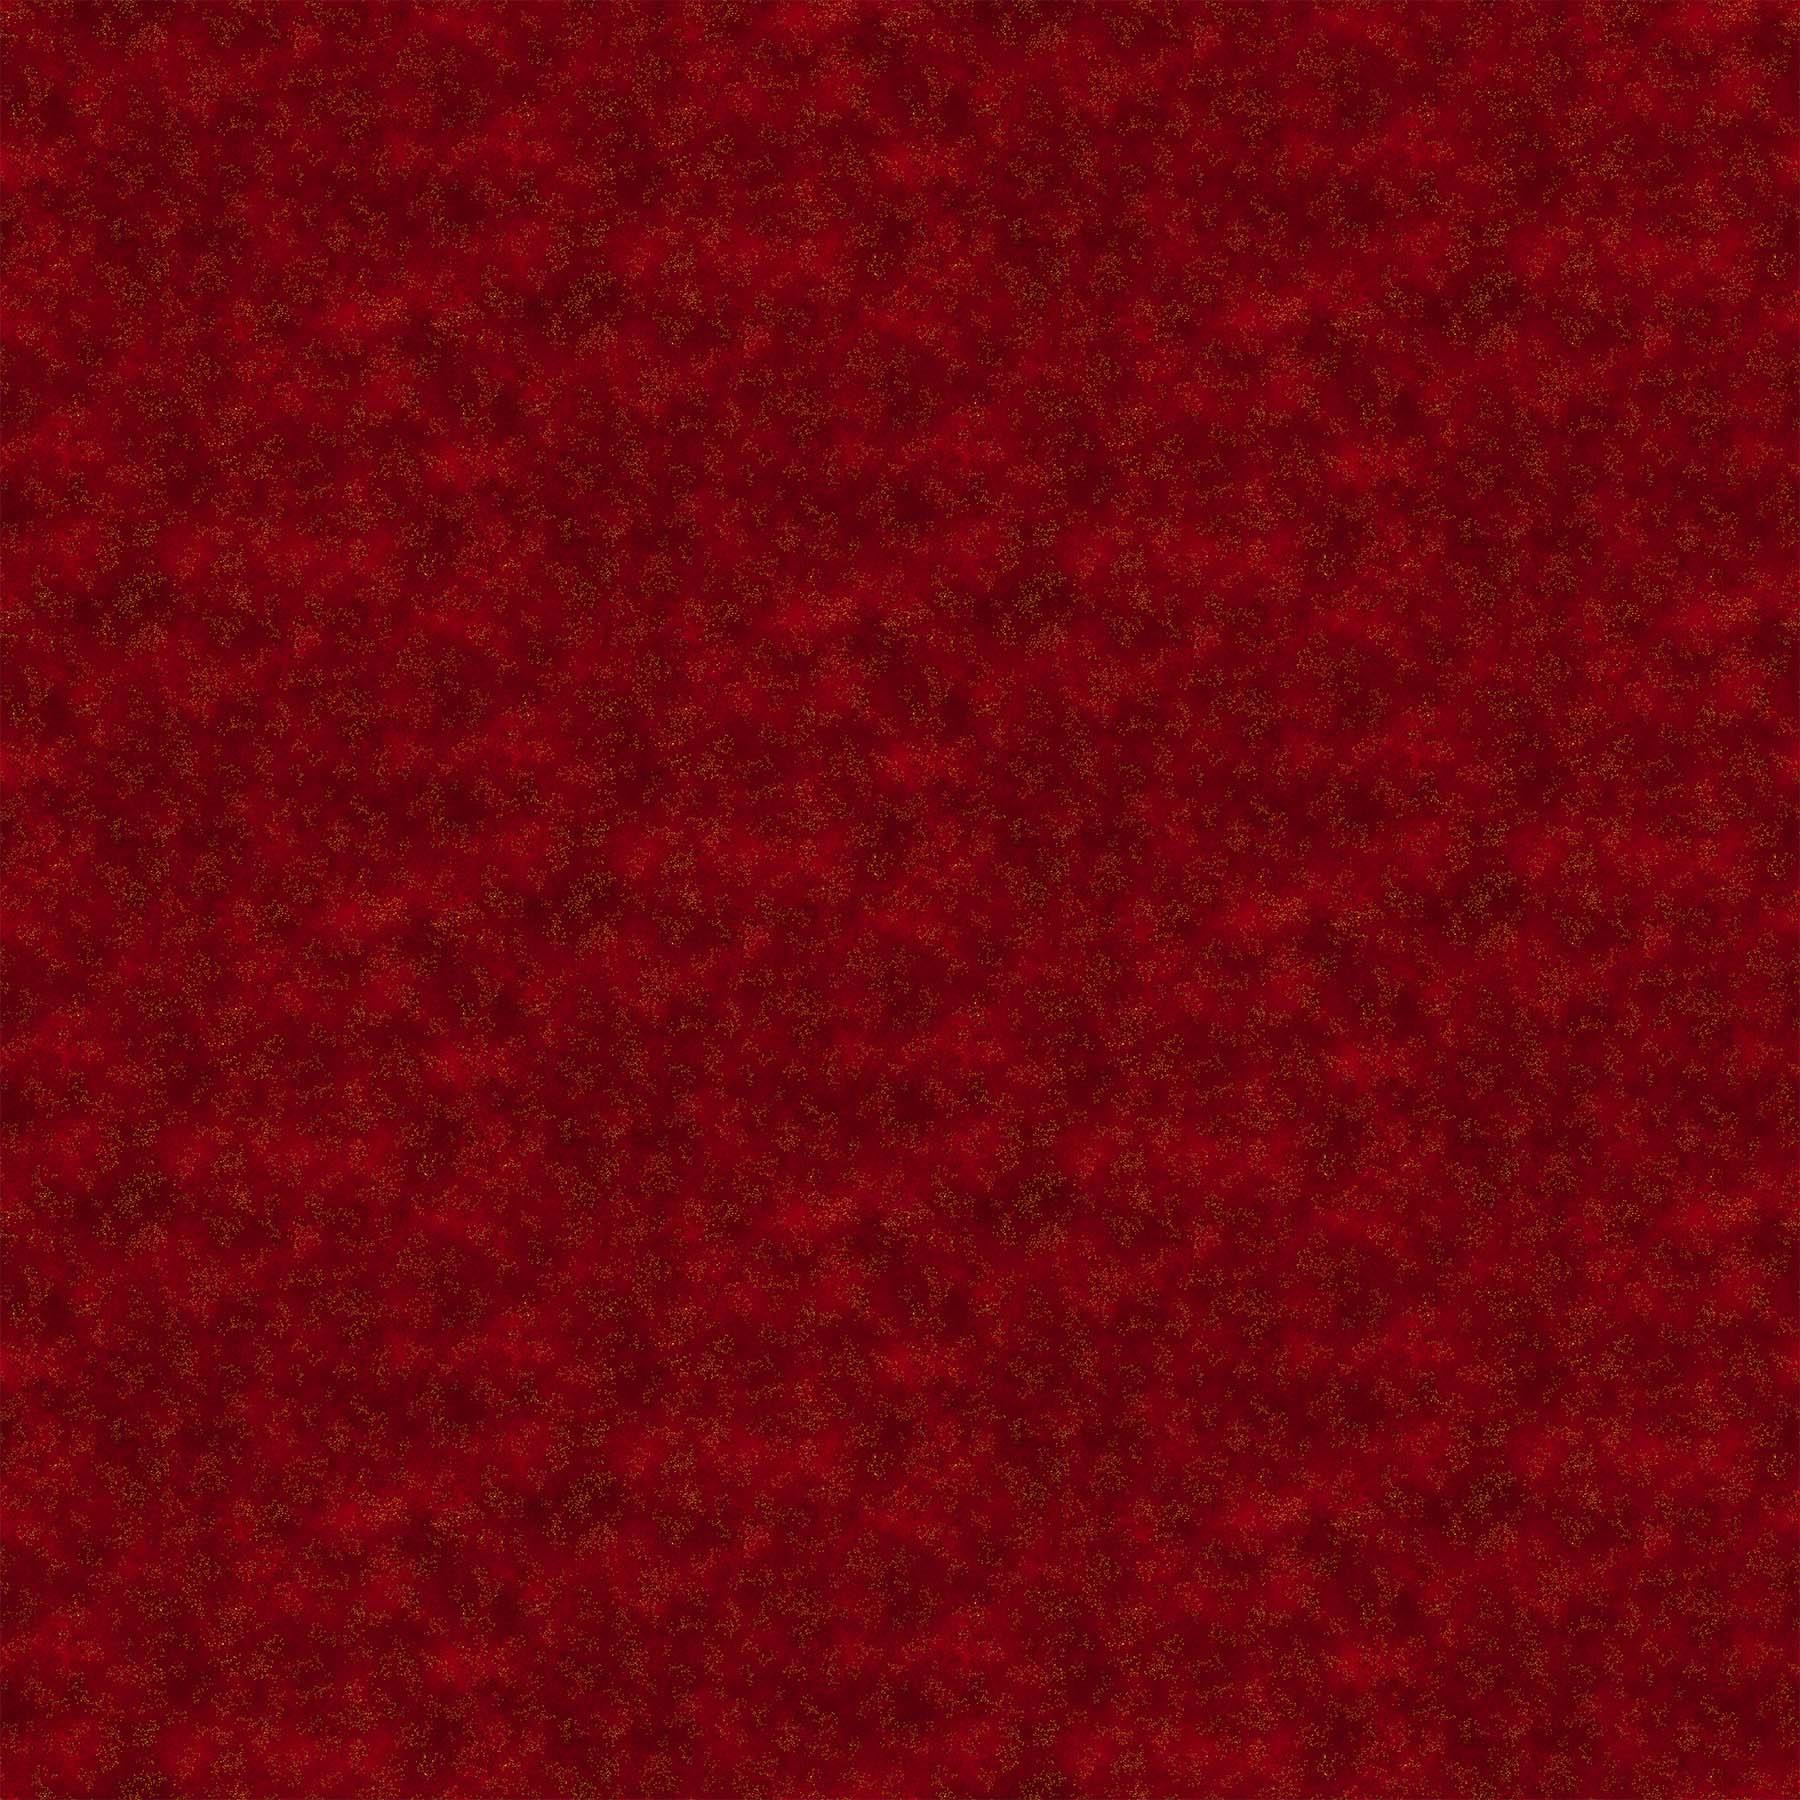 SHIMMER FROST DARK RED RADIANCE